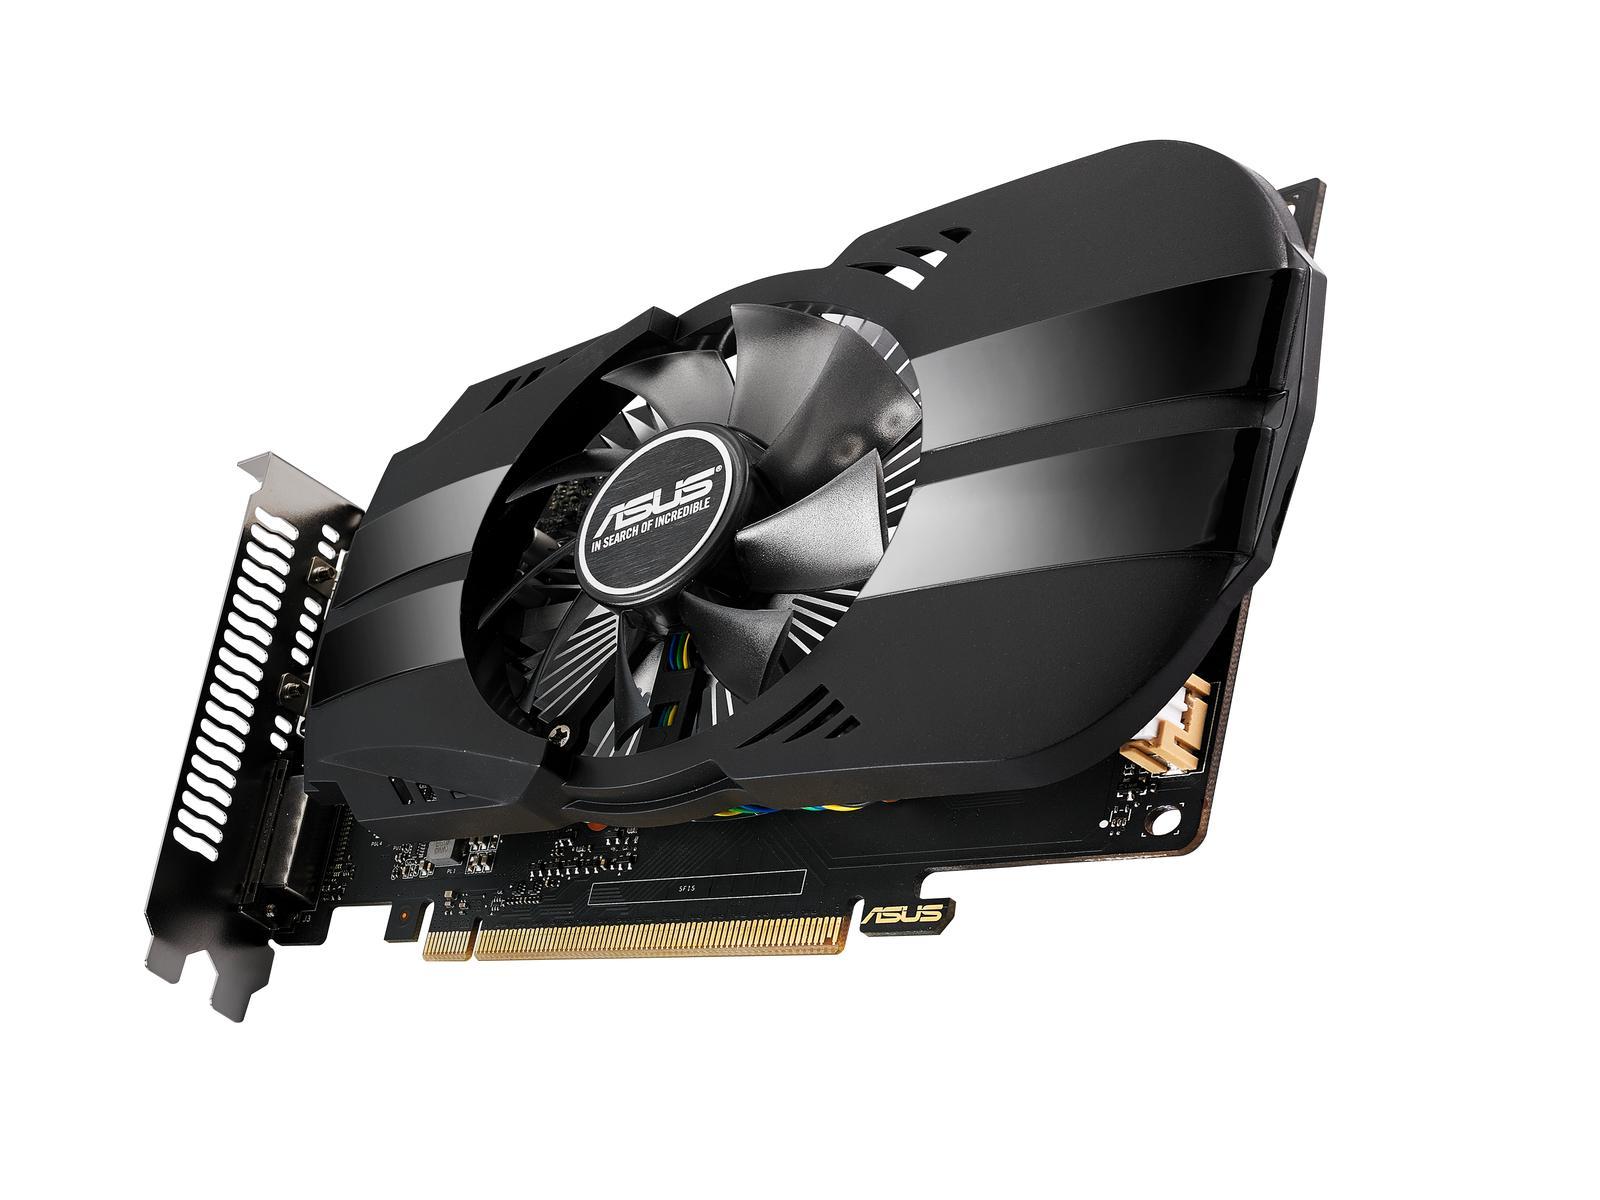 Asus GeForce GTX 1050 Ti 4 GB Phoenix Video Card